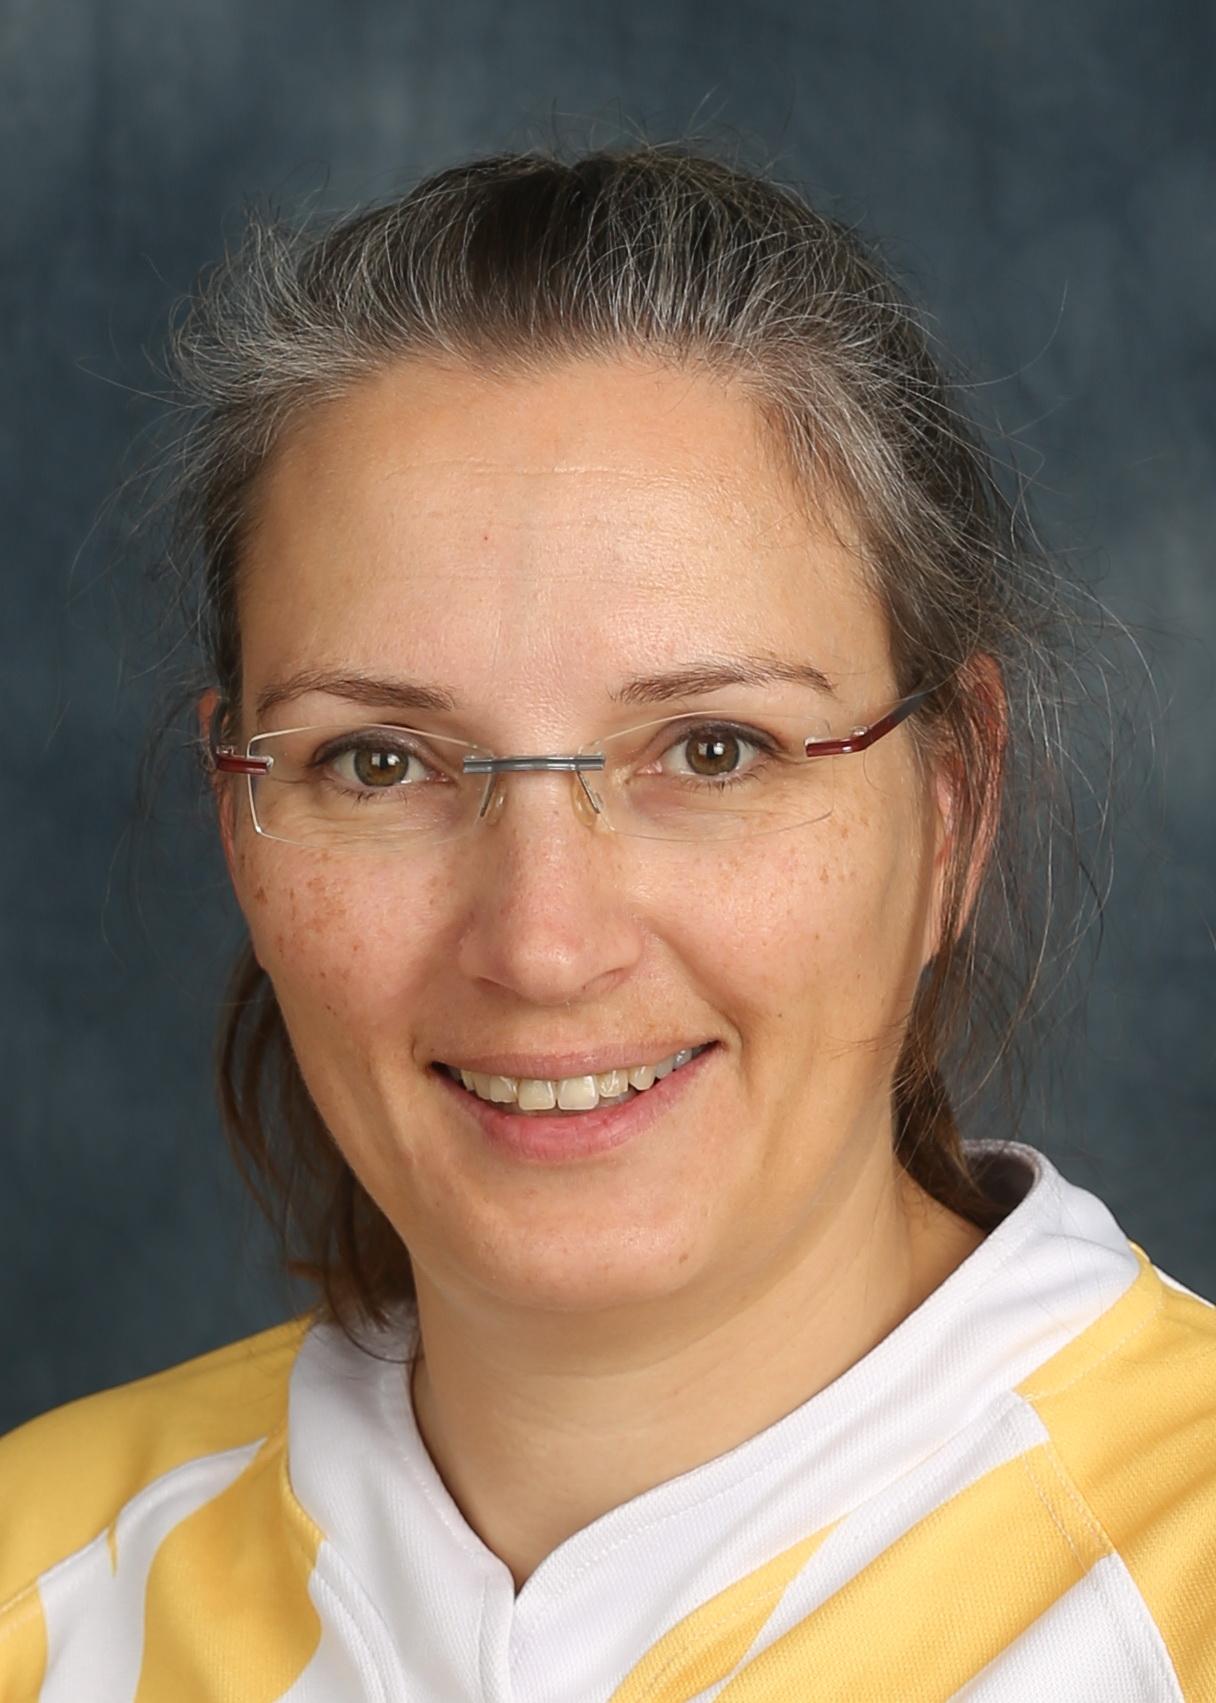 Sonja Dreher